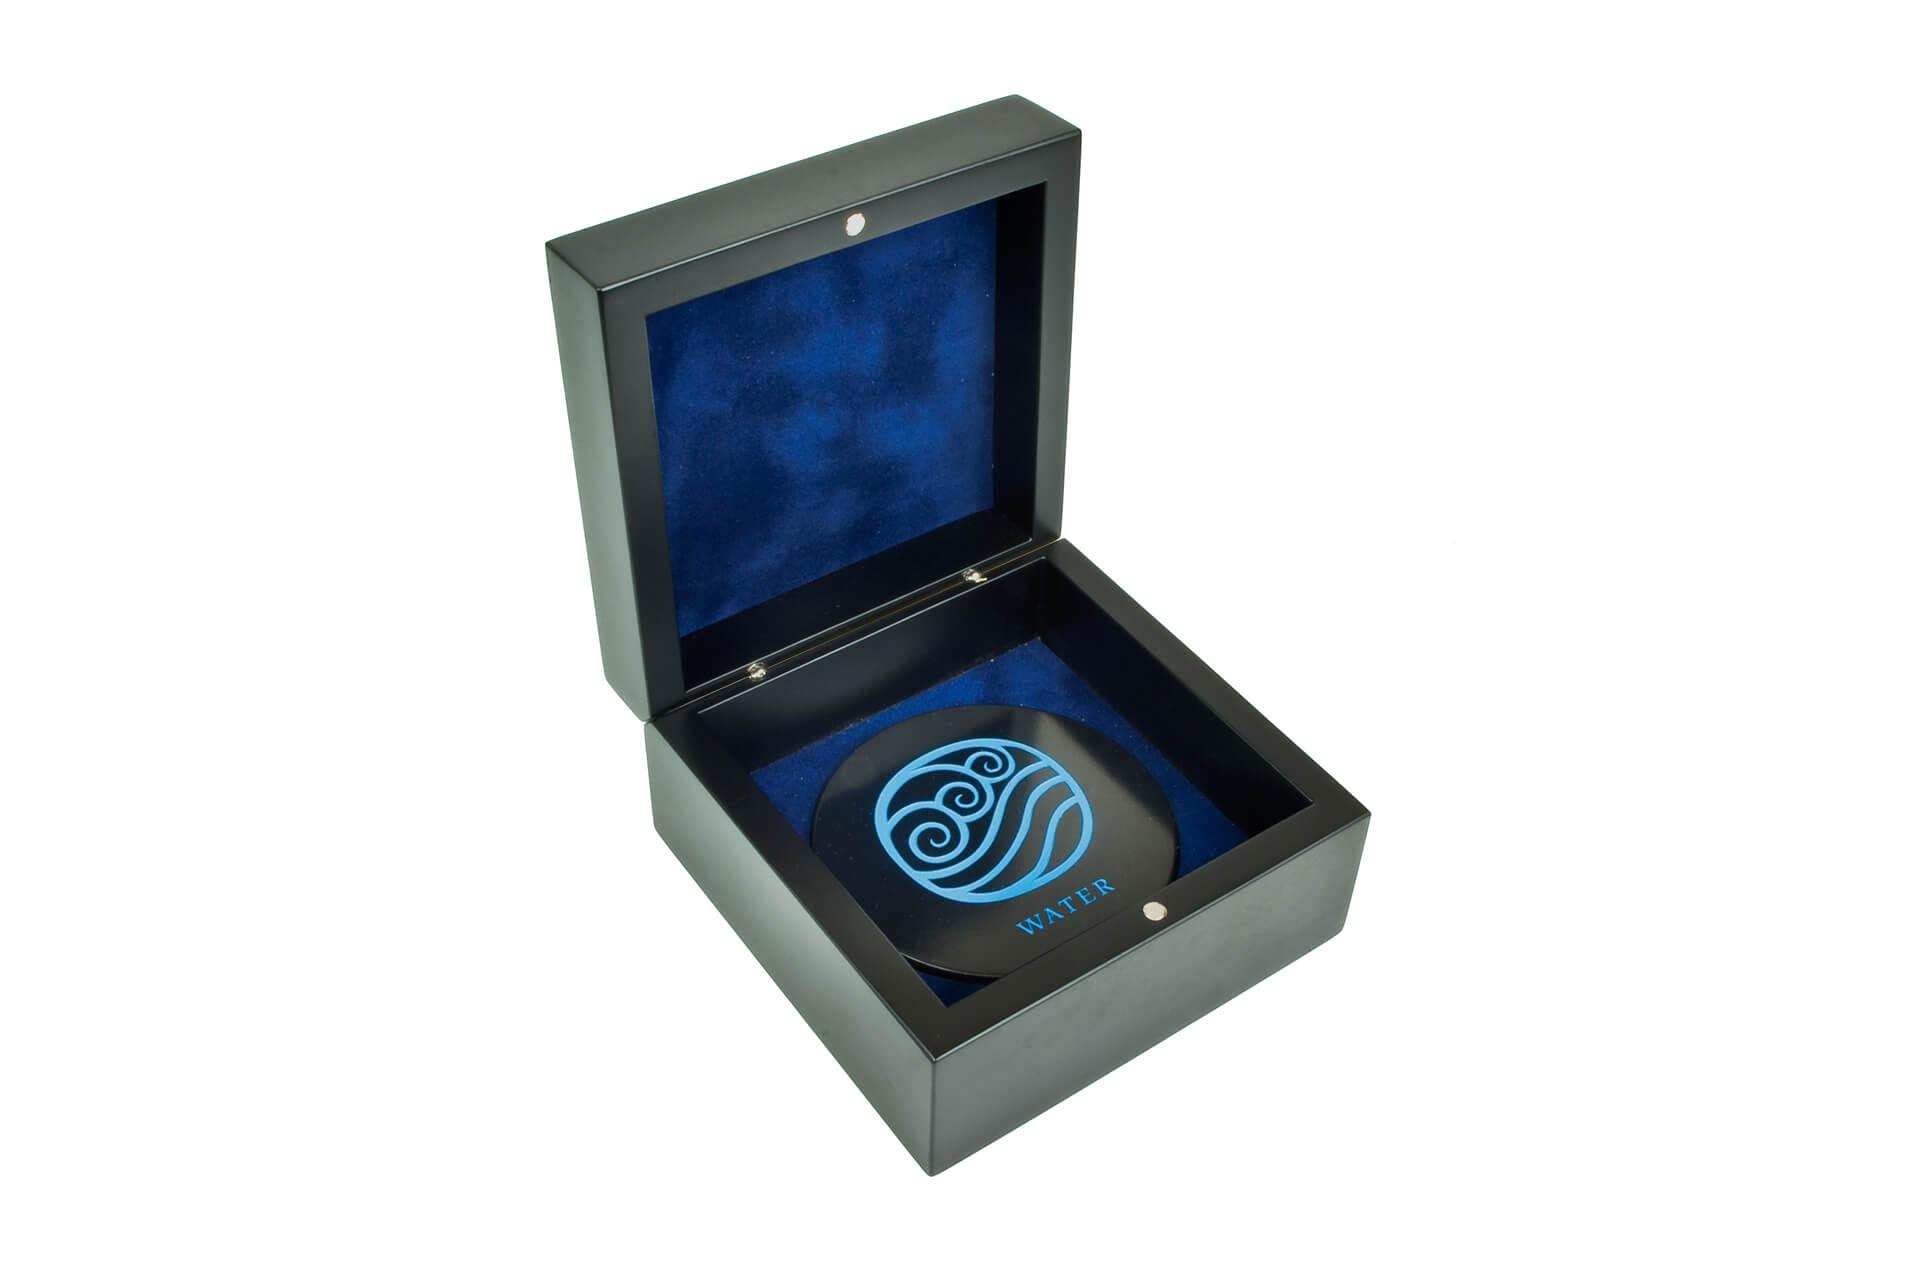 bespoke wooden car wax packaging laser engraved blue infill open showing lining